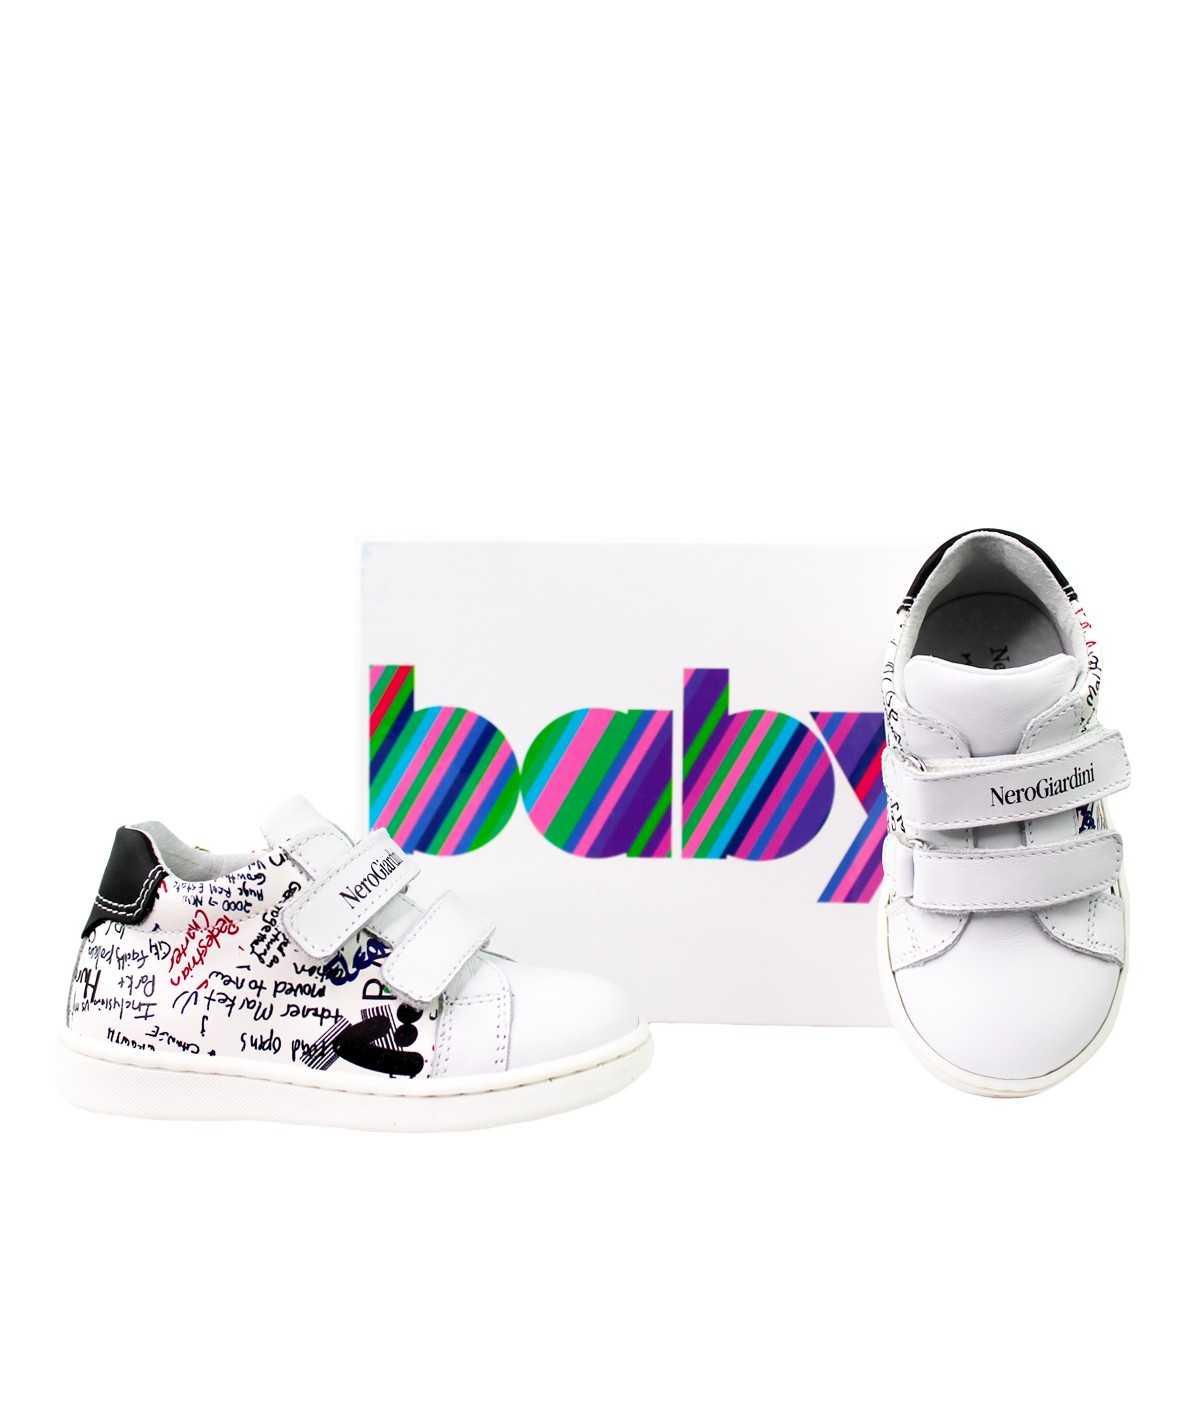 NEROGIARDINI Baby Sneakers...